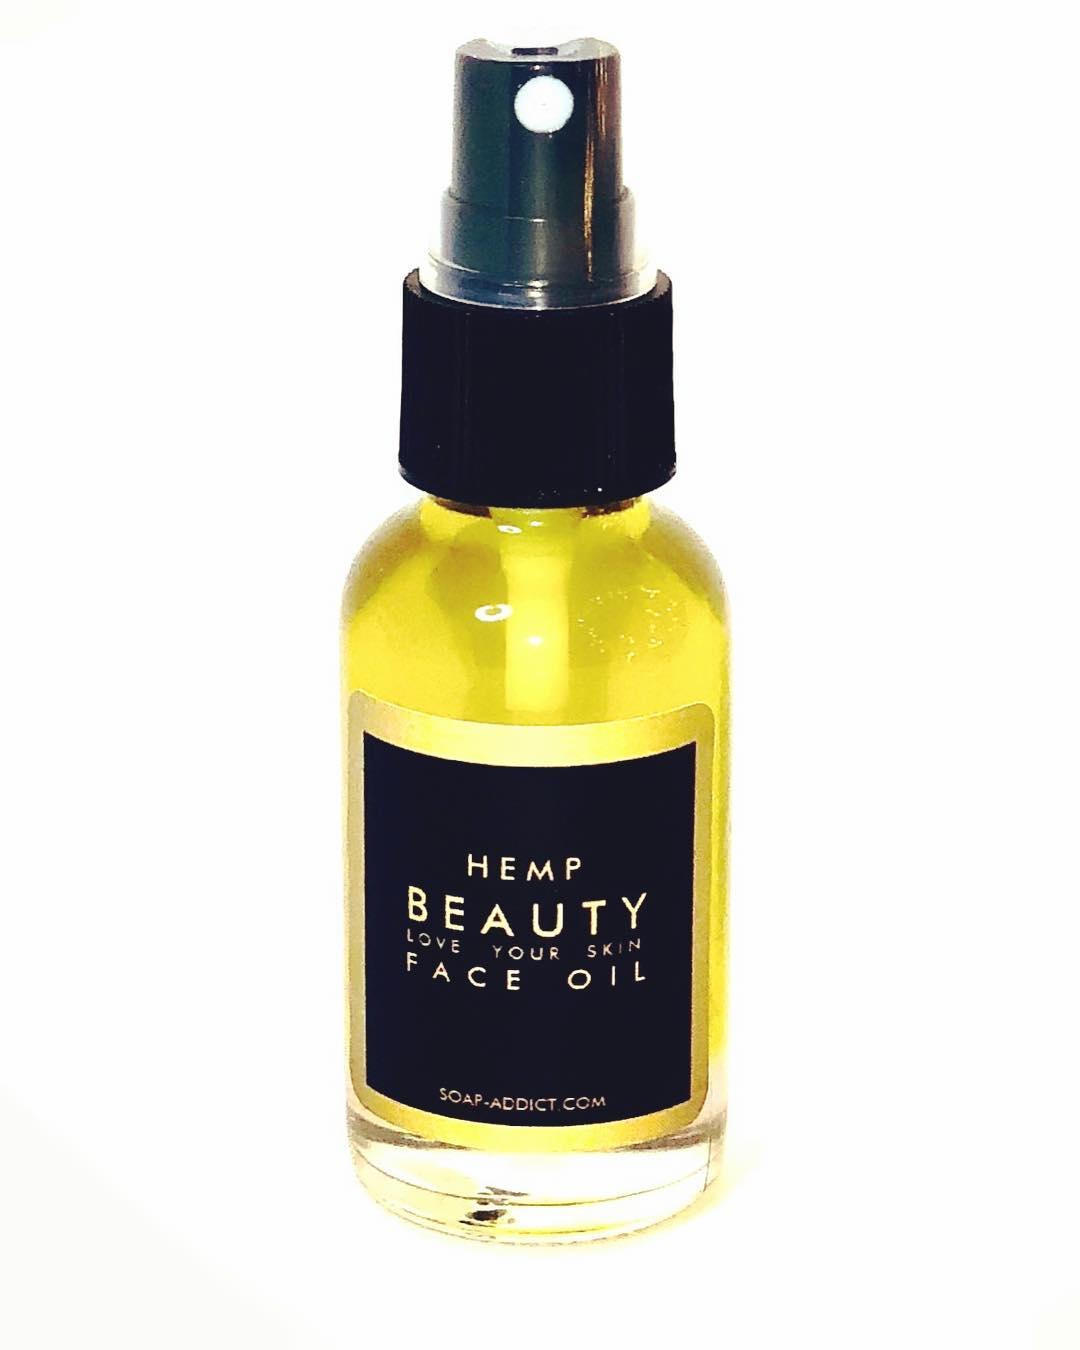 hemp-oil-beauty-face-oil-imasoapadict1oz.jpg